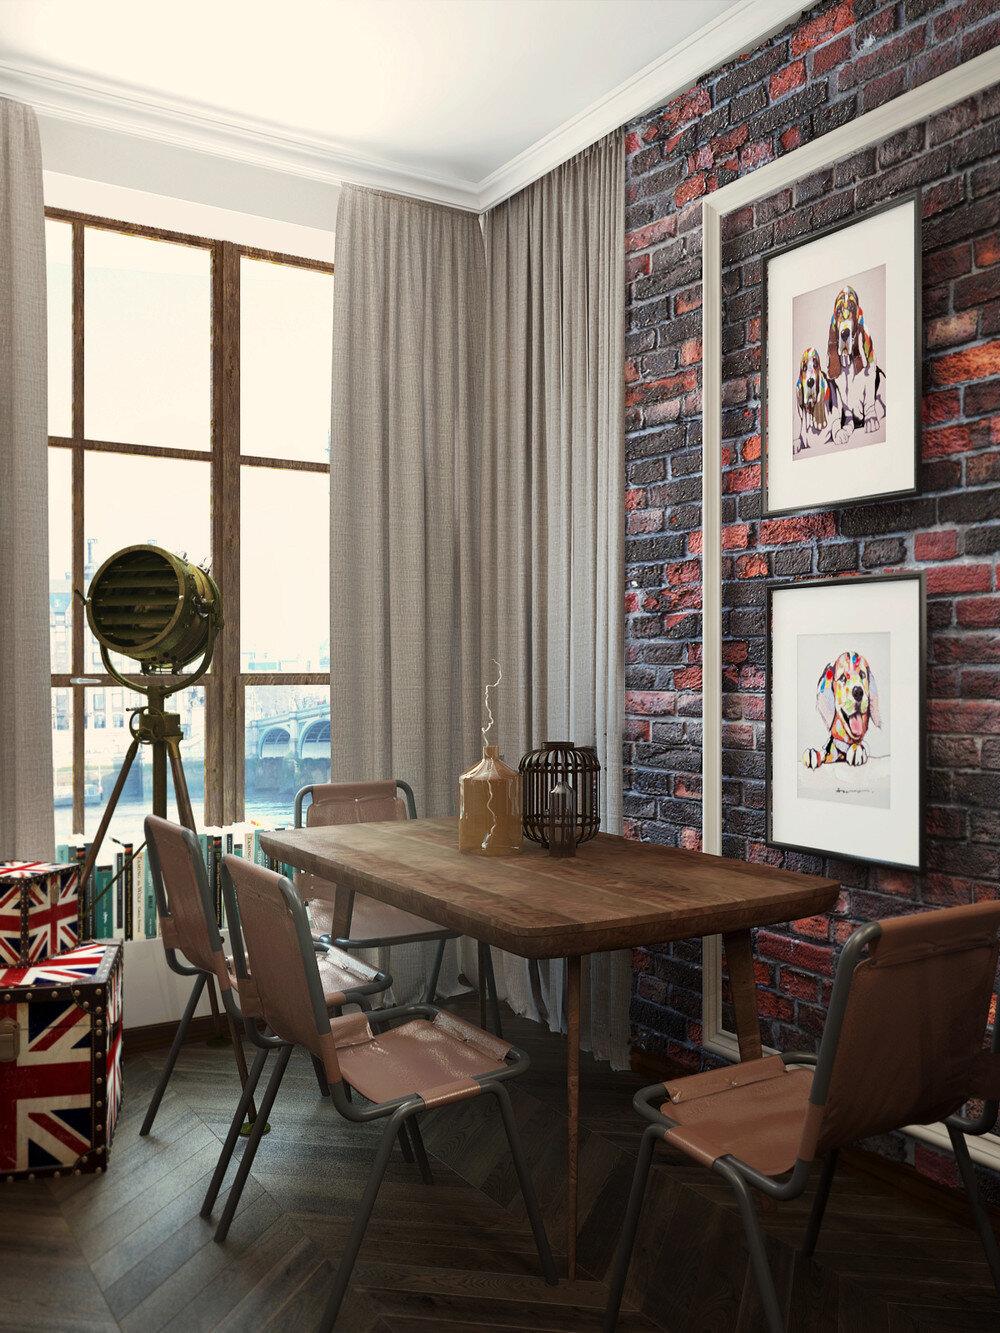 London Sky Eclectic 32 Sqm Studio Apartment In London